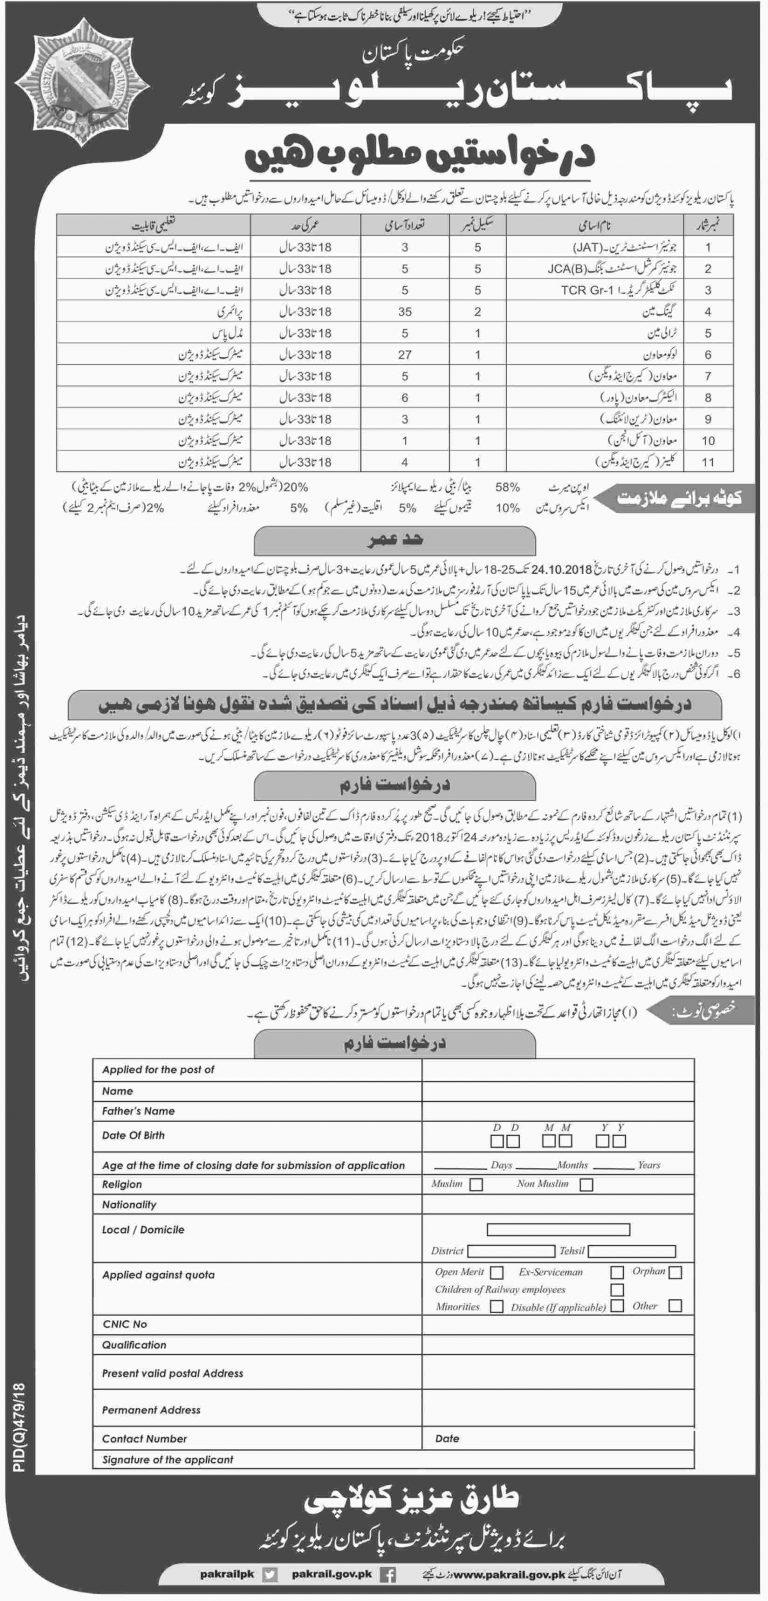 Pakistan Railway Quetta Division Jobs October 2018 Application Form Download Latest